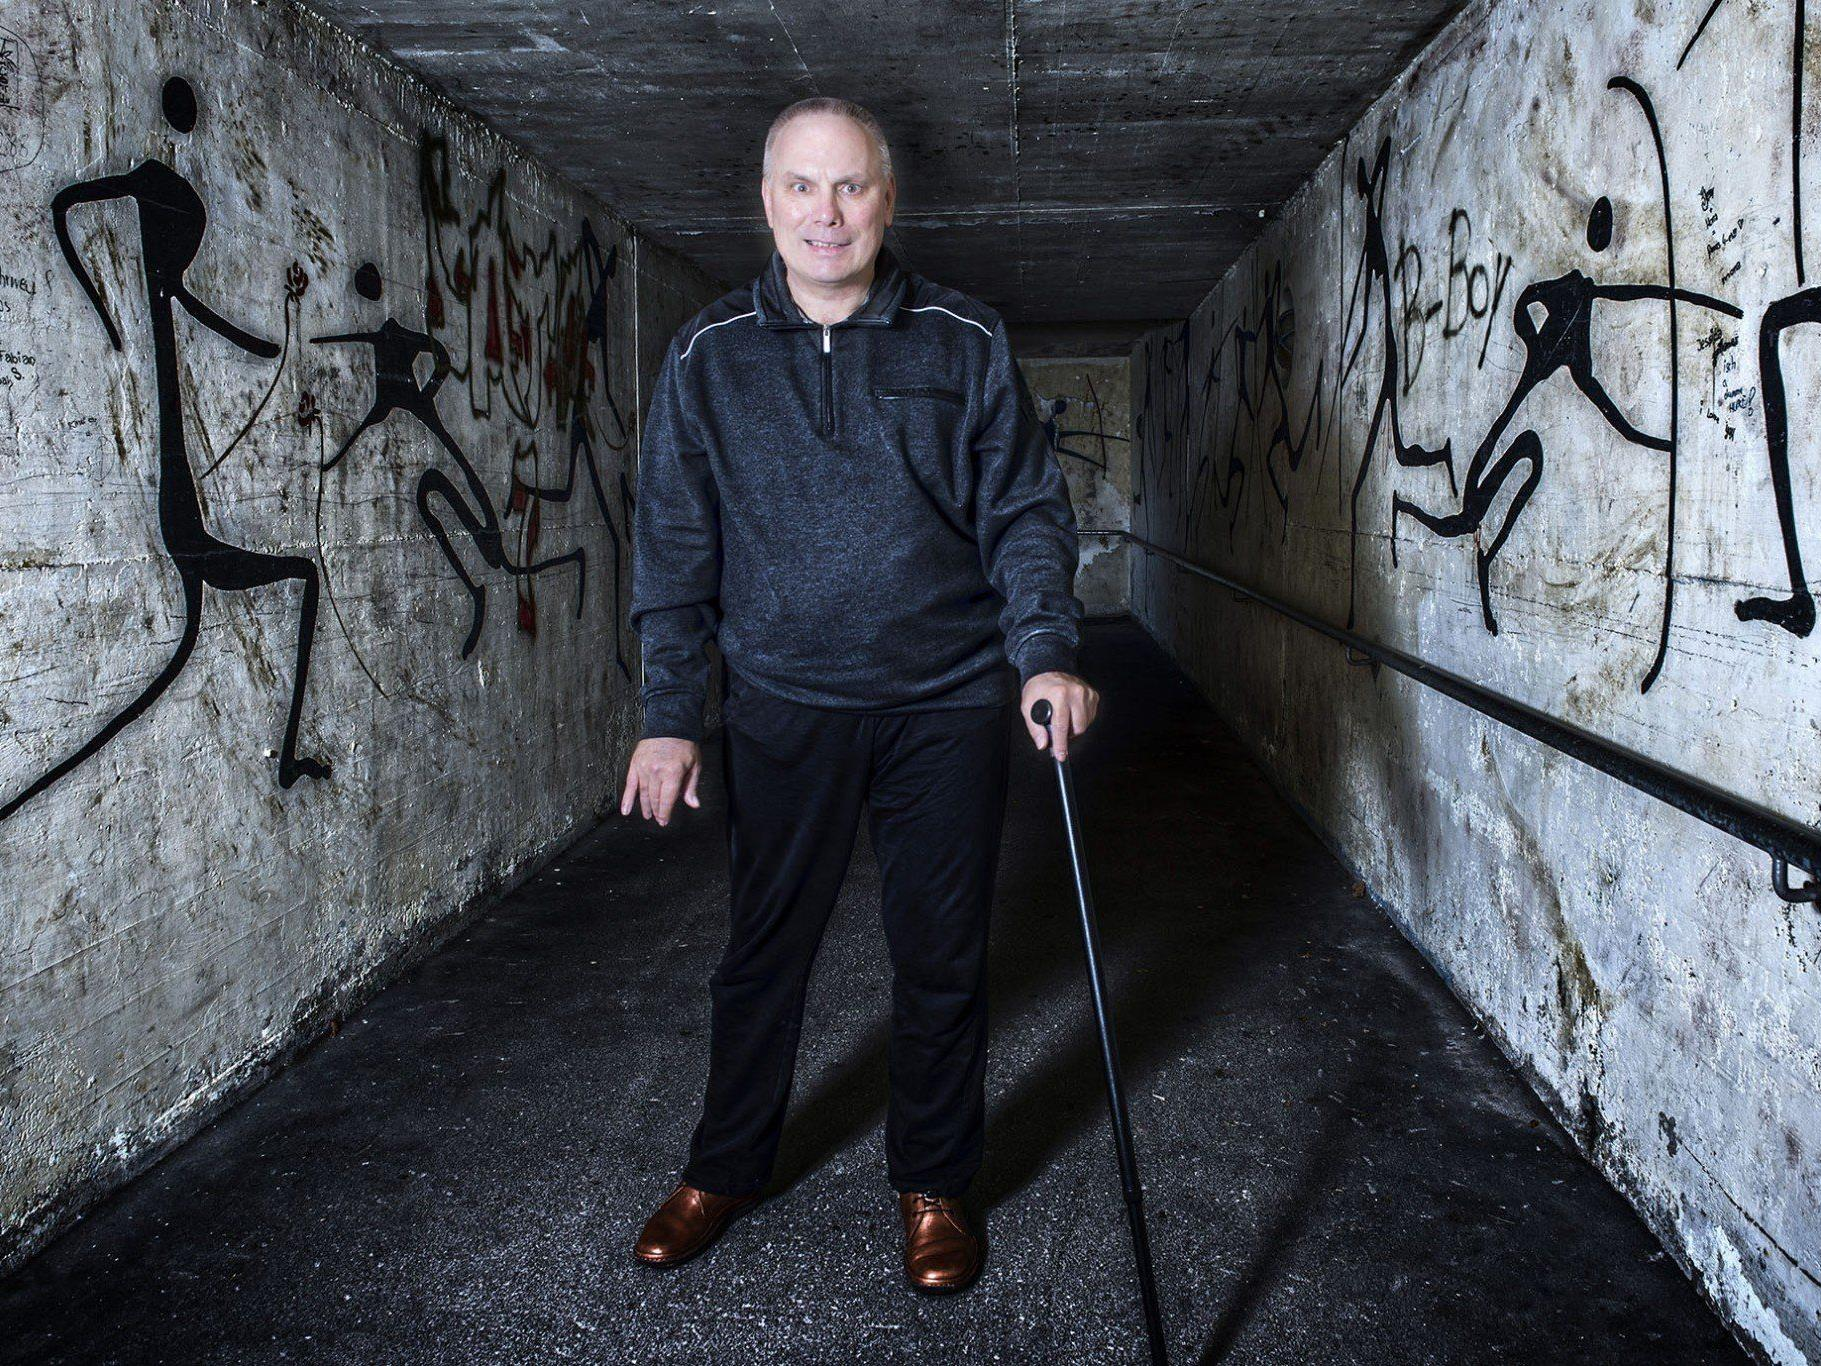 Gehirnschlag-Patient Kurt Gerszi aus Tschagguns ist Obmann des Montafoner Selbsthilfevereins.